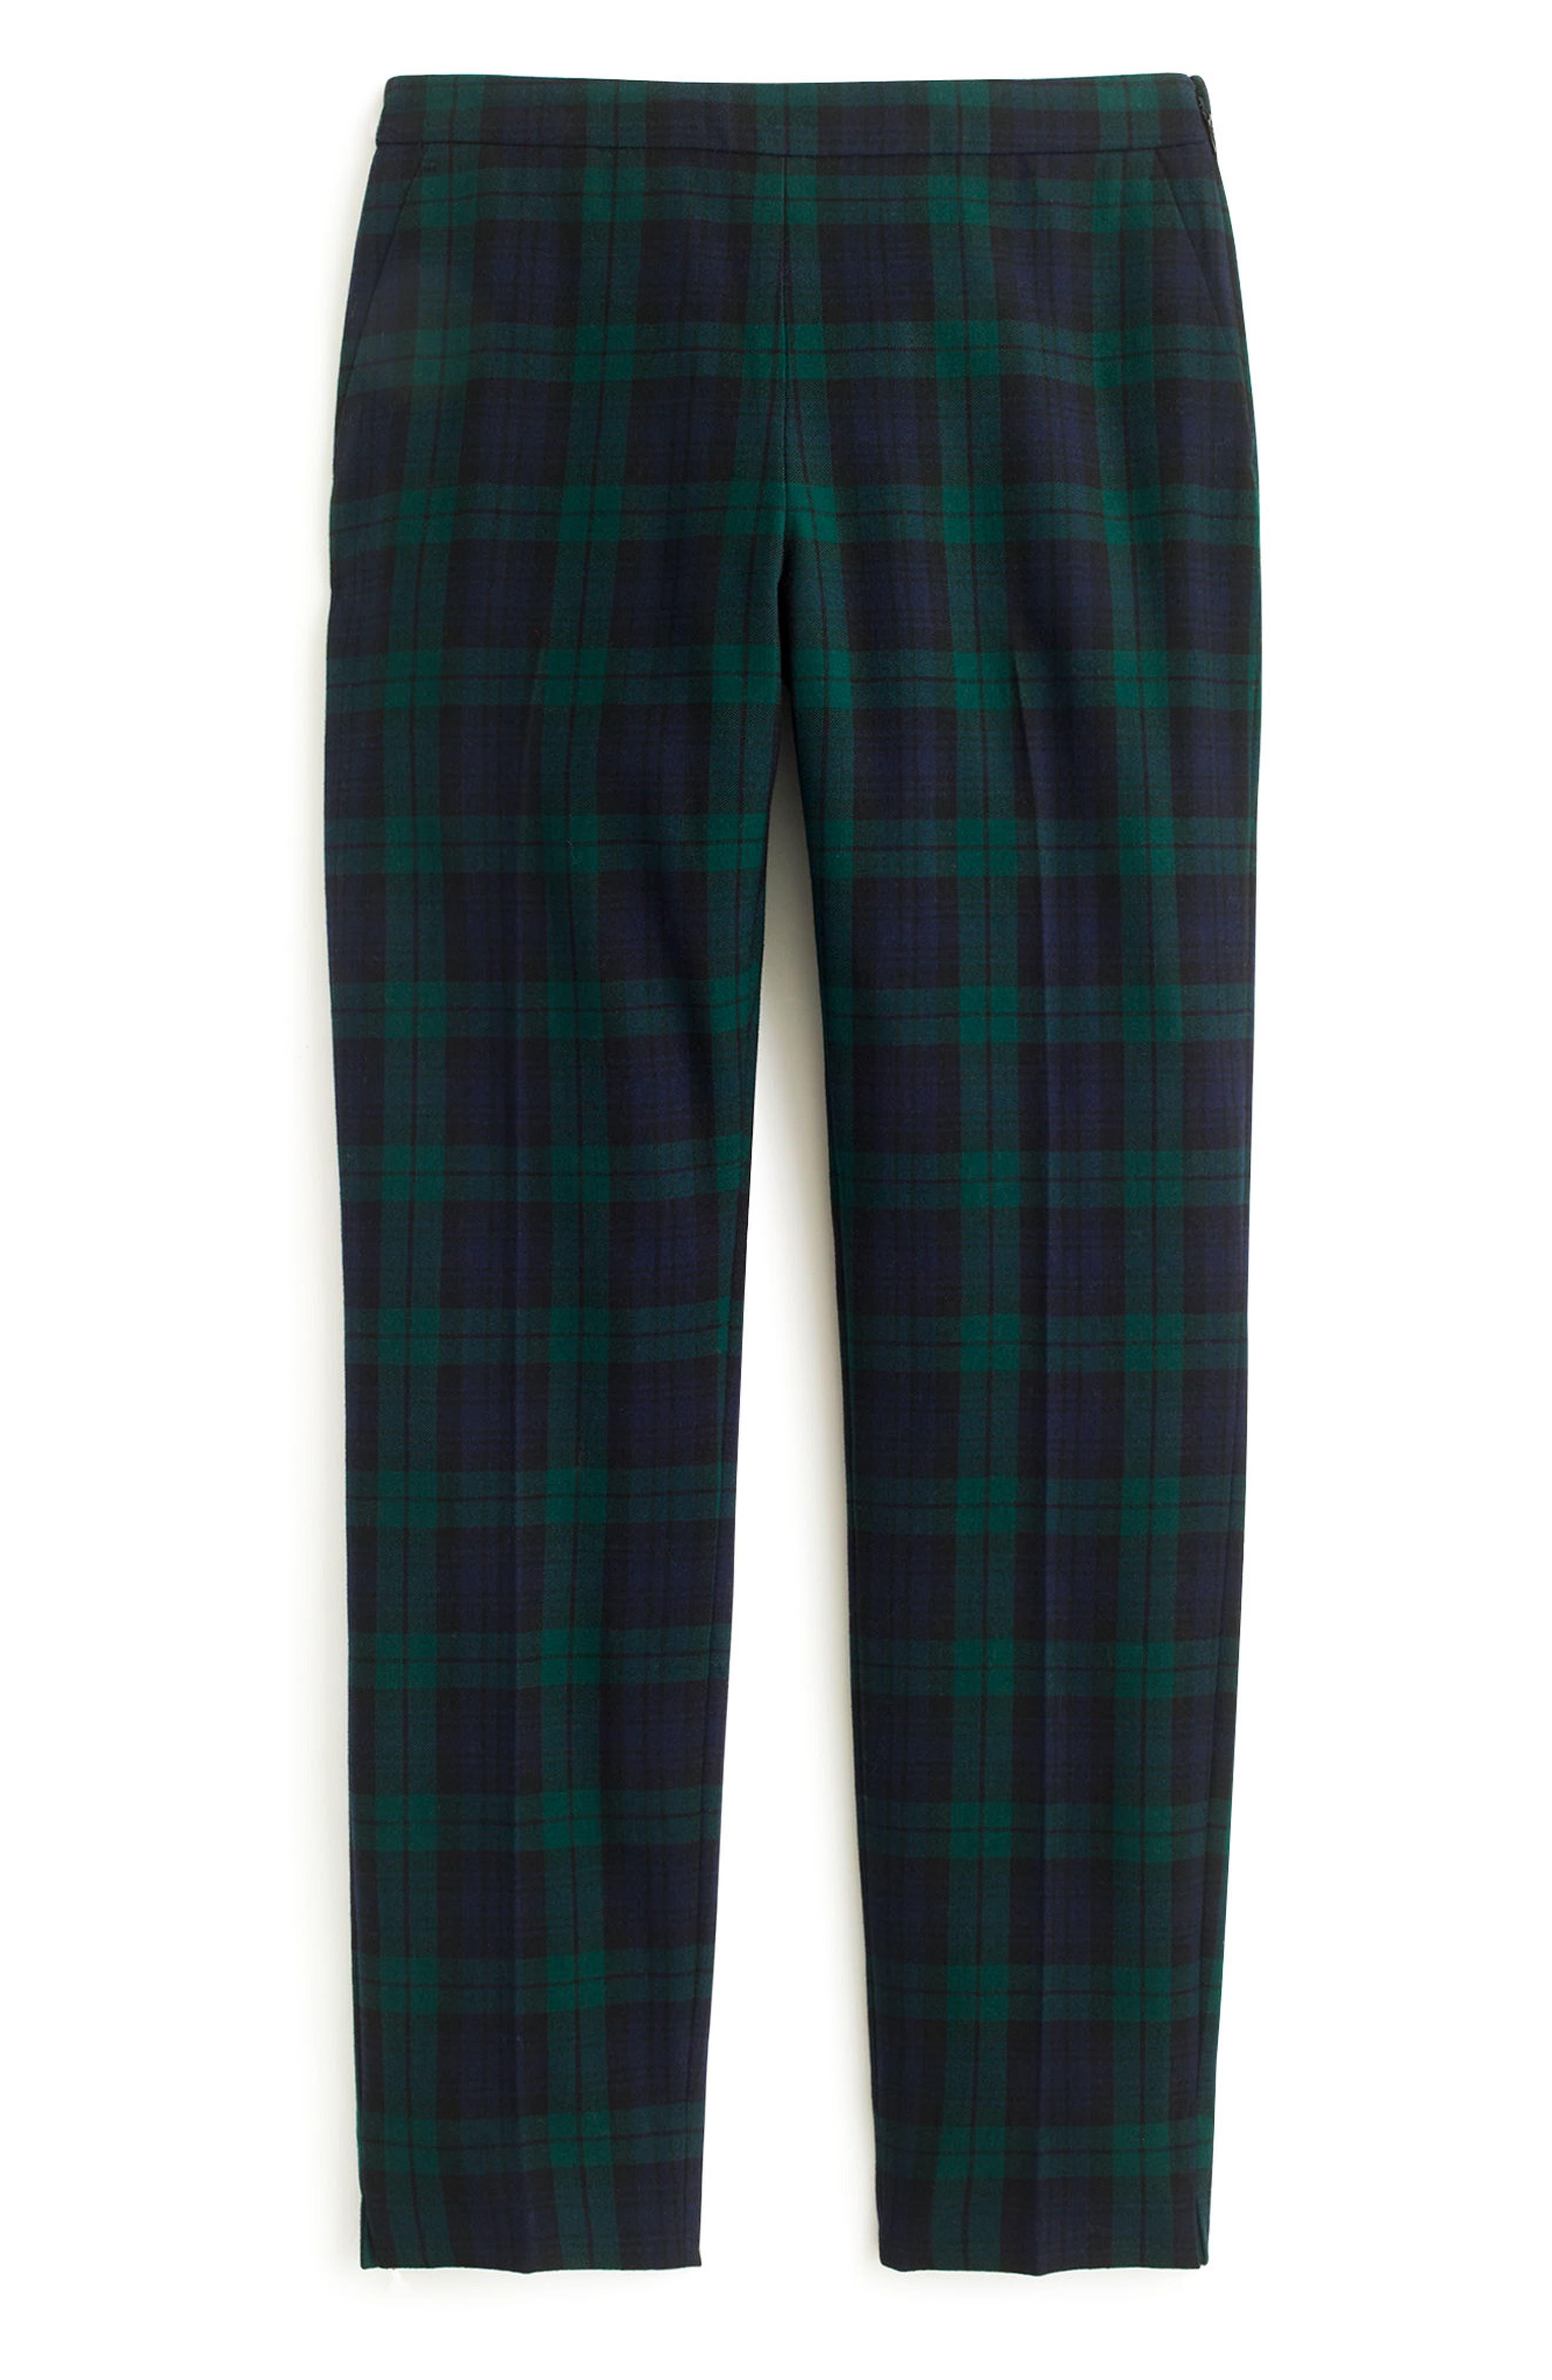 Martie Black Watch Stretch Wool Blend Crop Pants,                         Main,                         color, NAVY MULTI